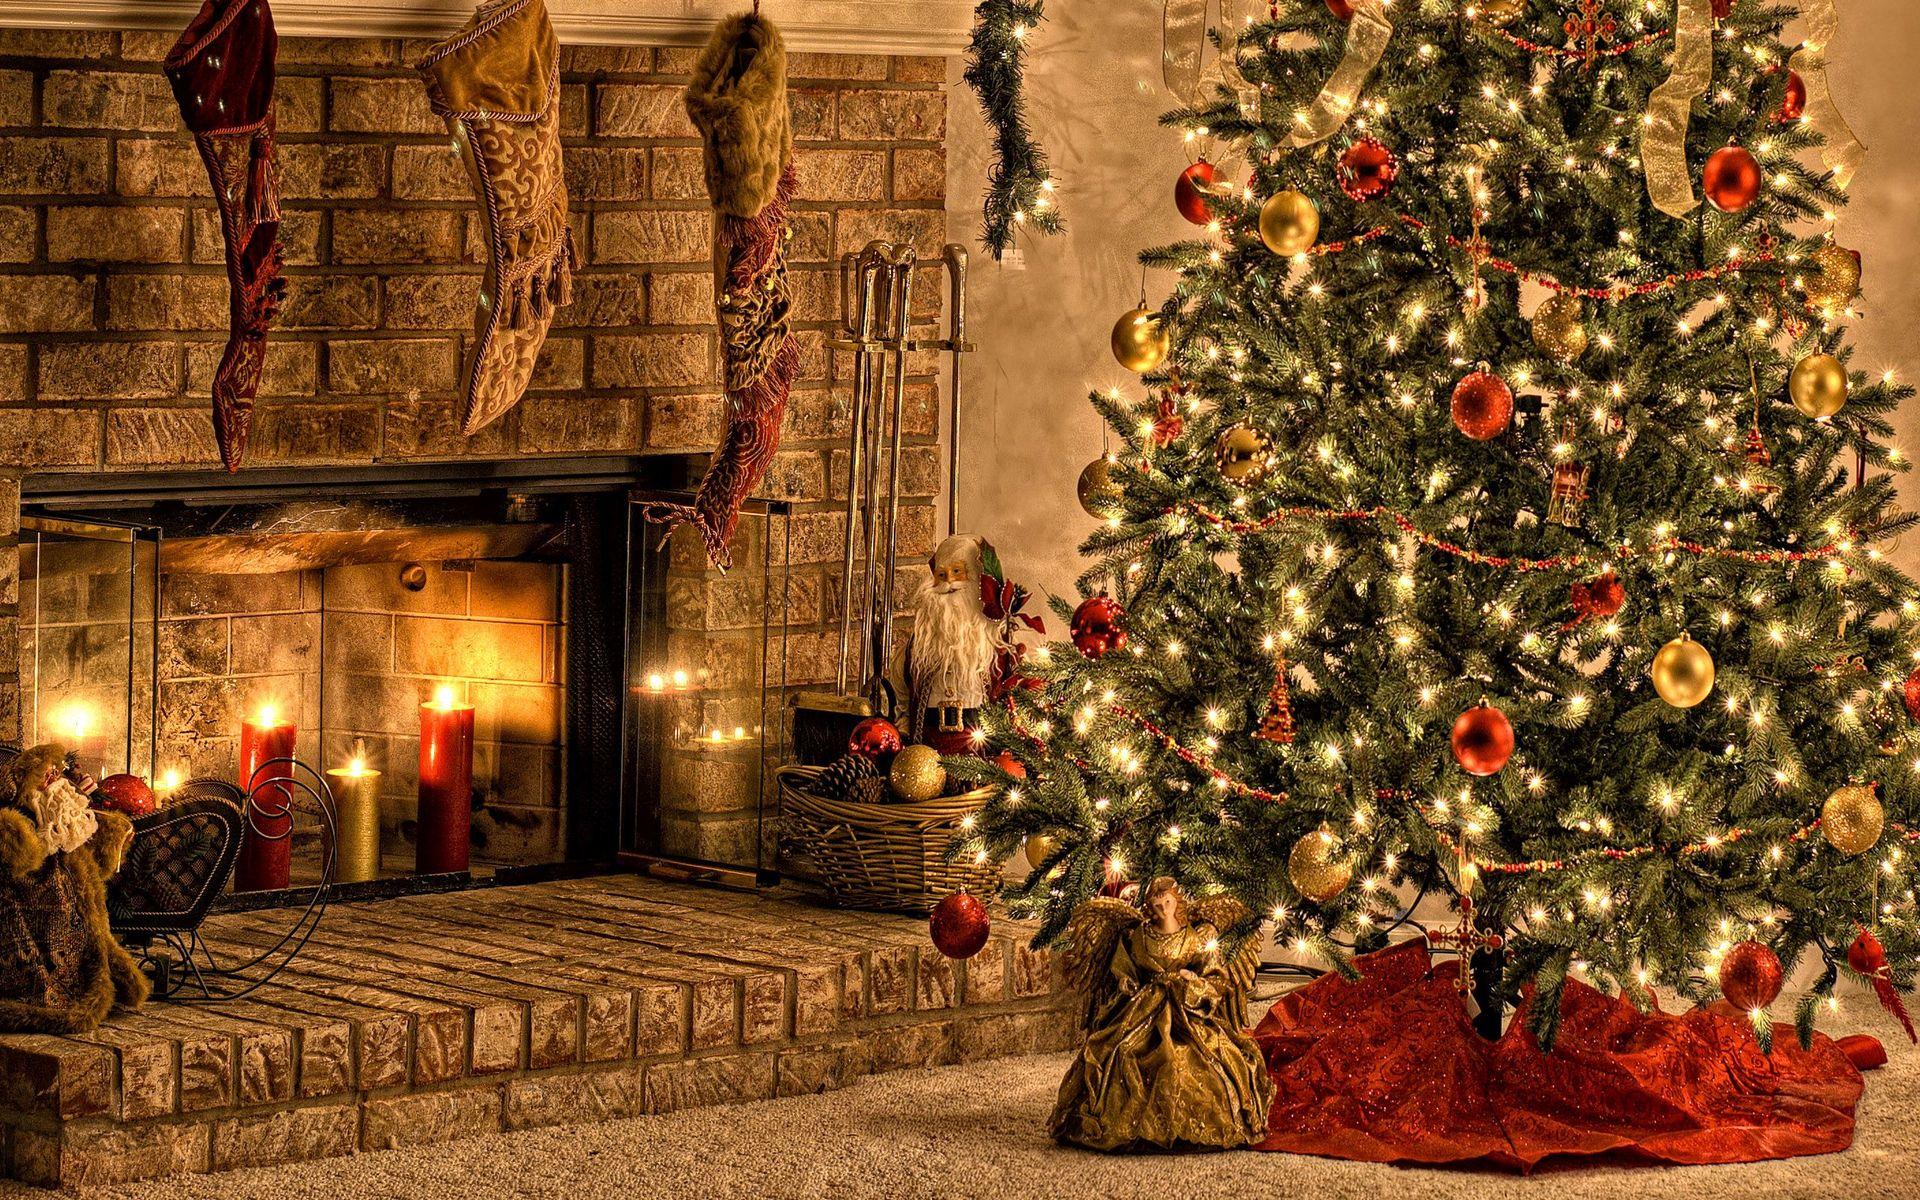 christmas night holiday hd wallpaper Wallpaper 1920x1200